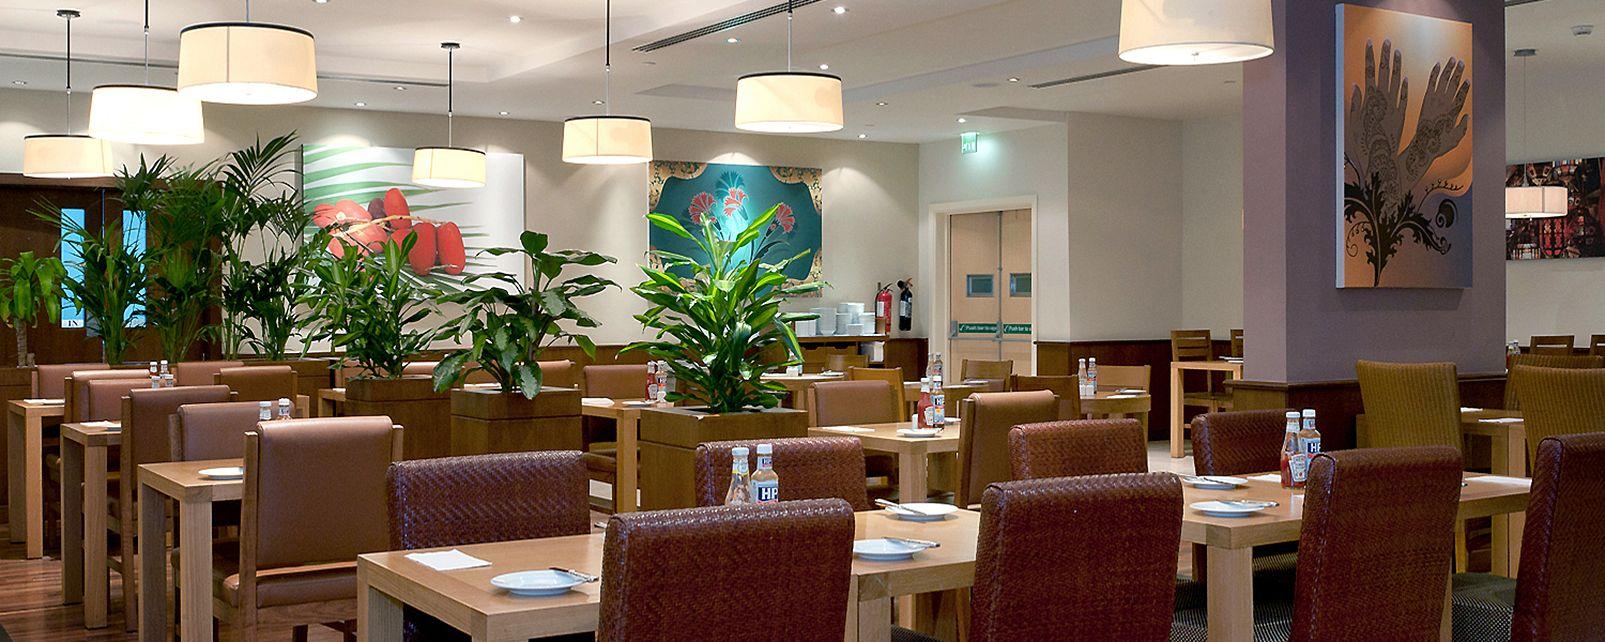 Hotel Premier Inn Dubai International Airport